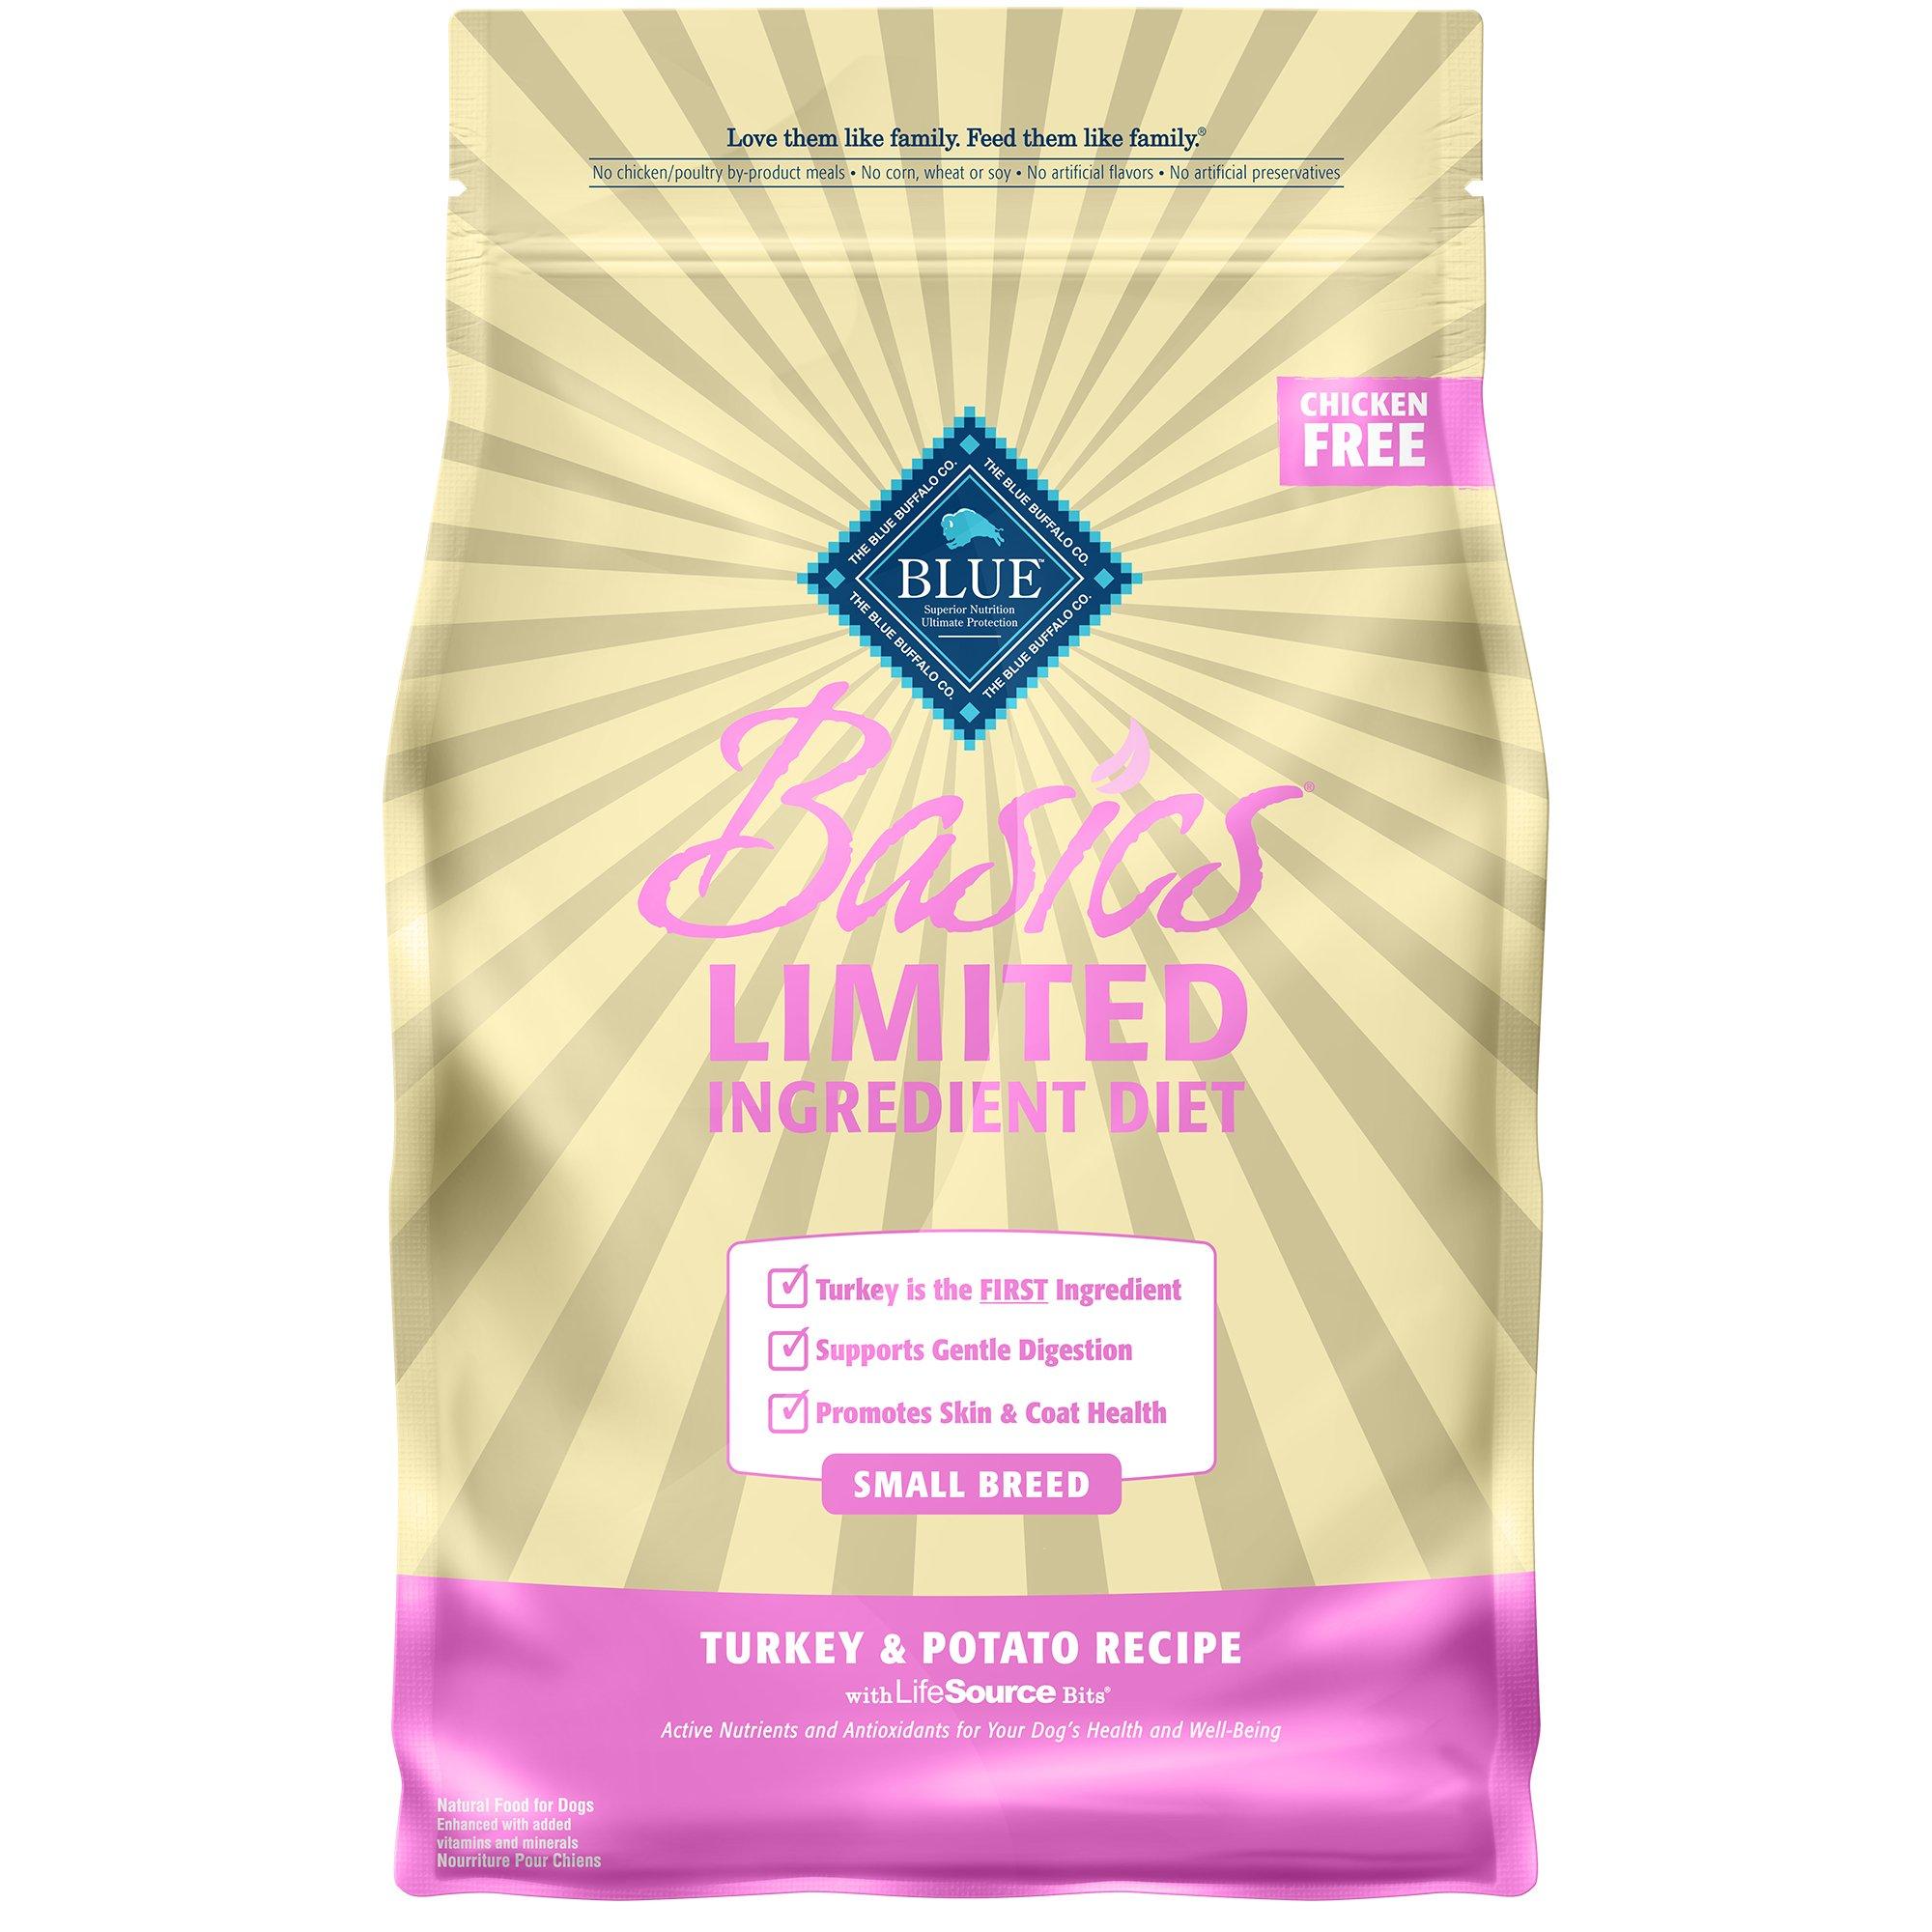 Blue Buffalo Small Breed Basics Limited Ingredient Formula Turkey & Potato Adult Dry Dog Food